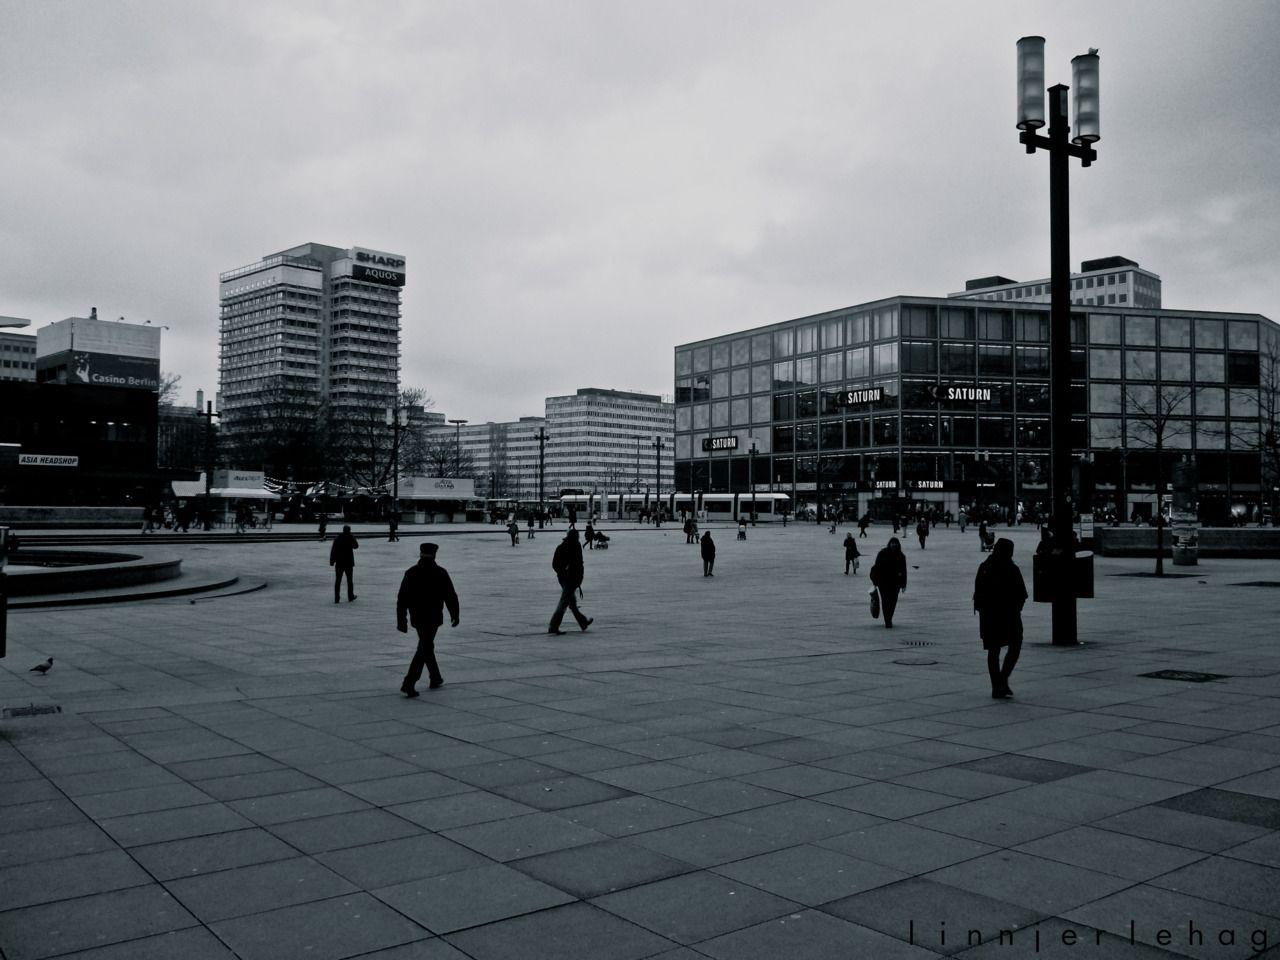 Ltrj Photography Alexanderplatz Berlin Willis Tower Landmarks Photography